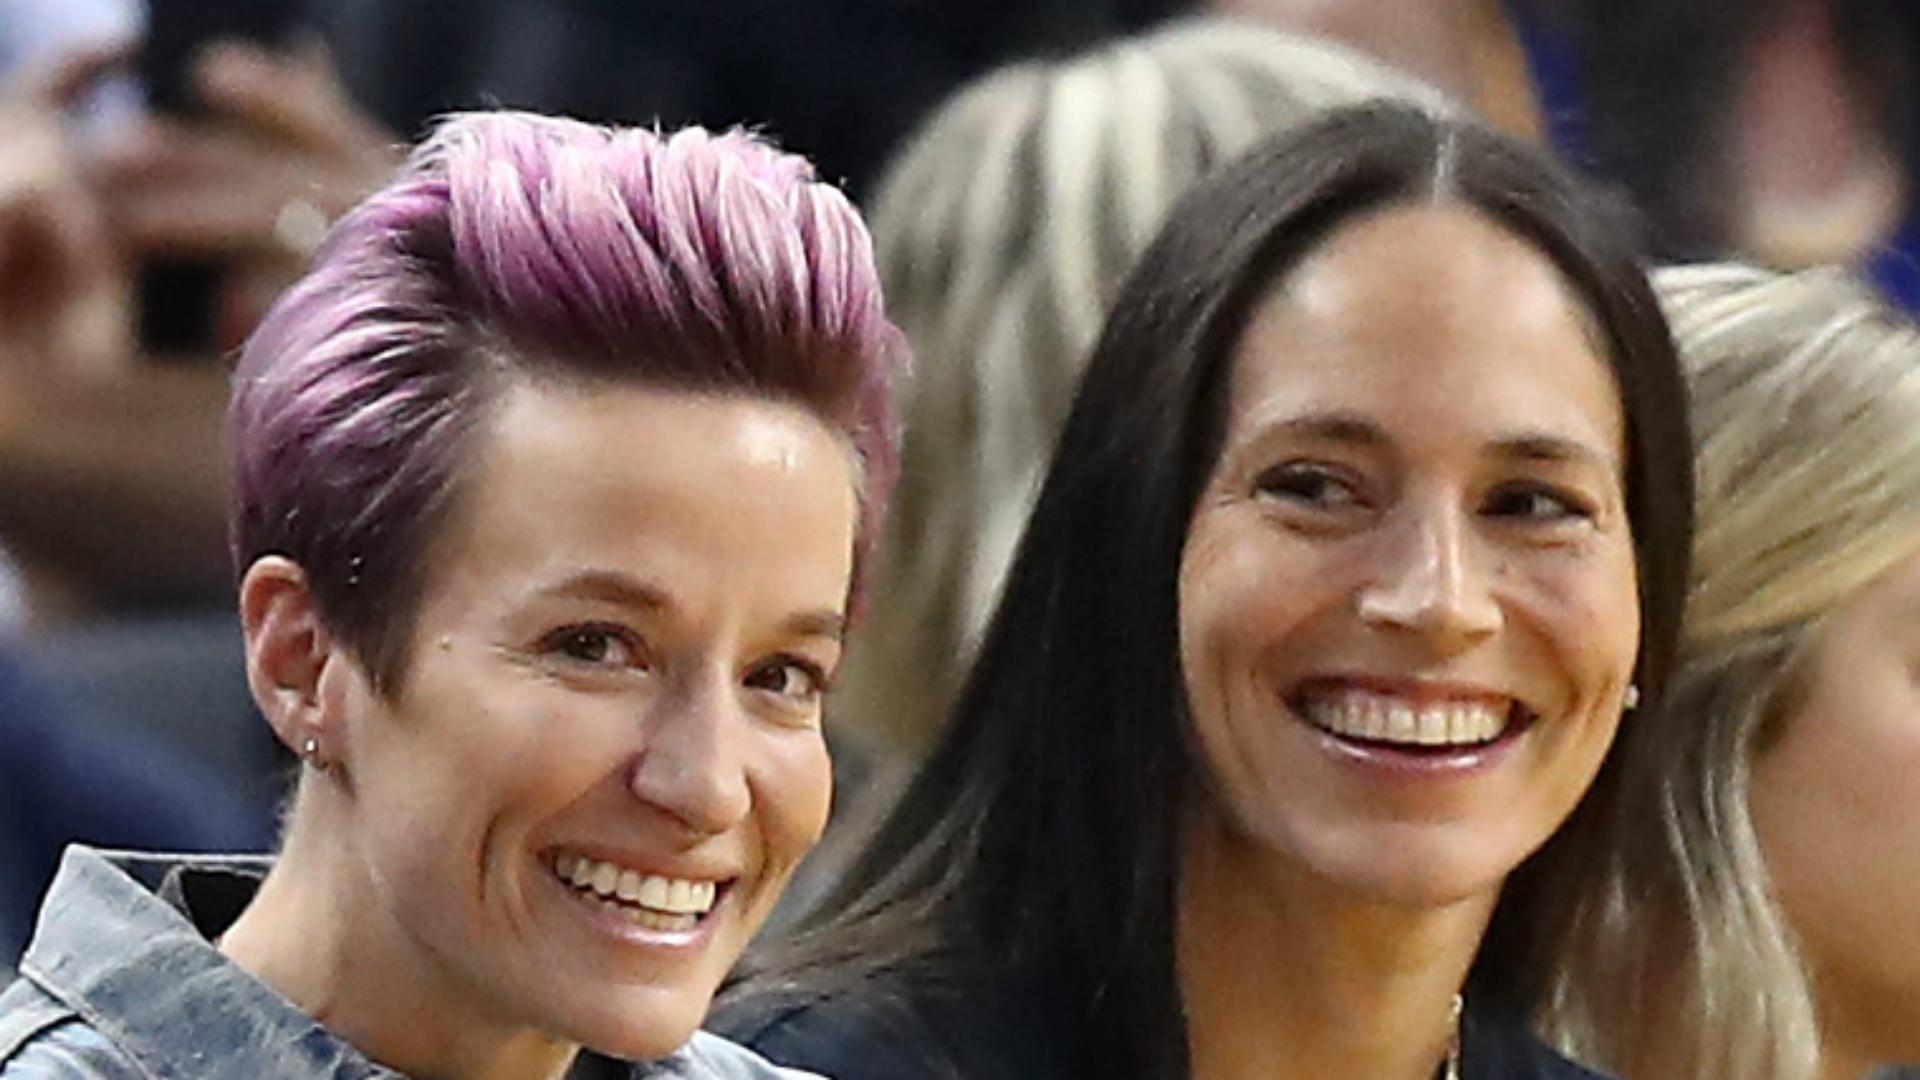 USA World Cup hero Rapinoe and WNBA star Bird engaged, Biden sends congratulations